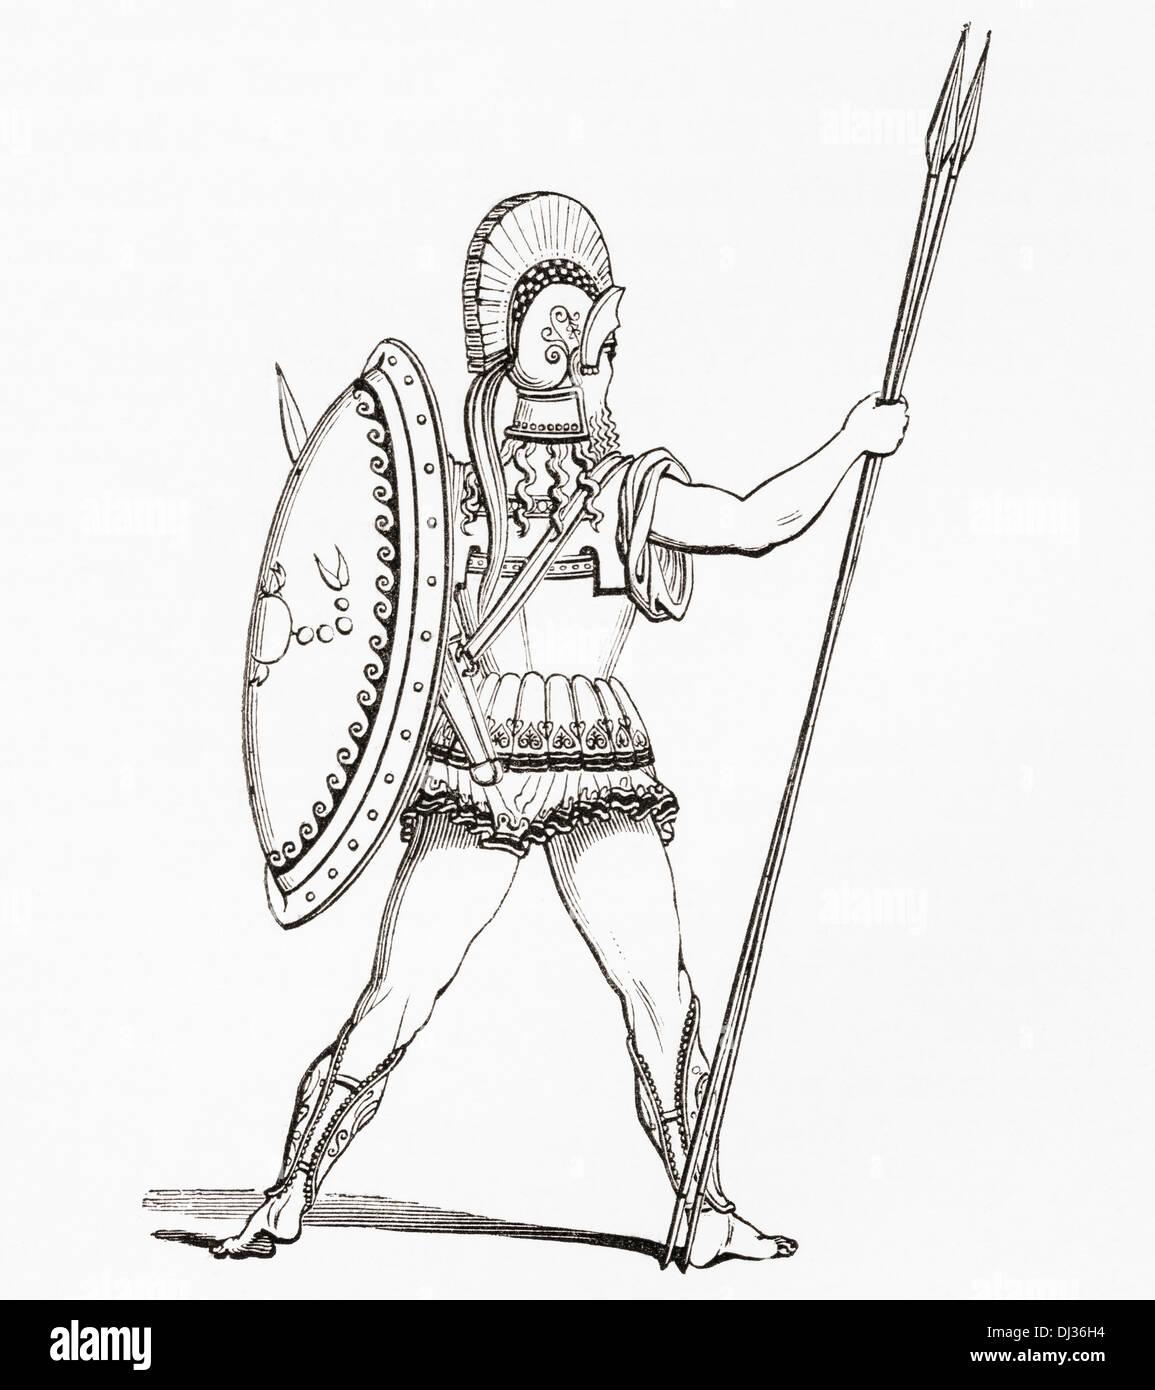 Heavily armed Greek warrior dressed for battle. - Stock Image